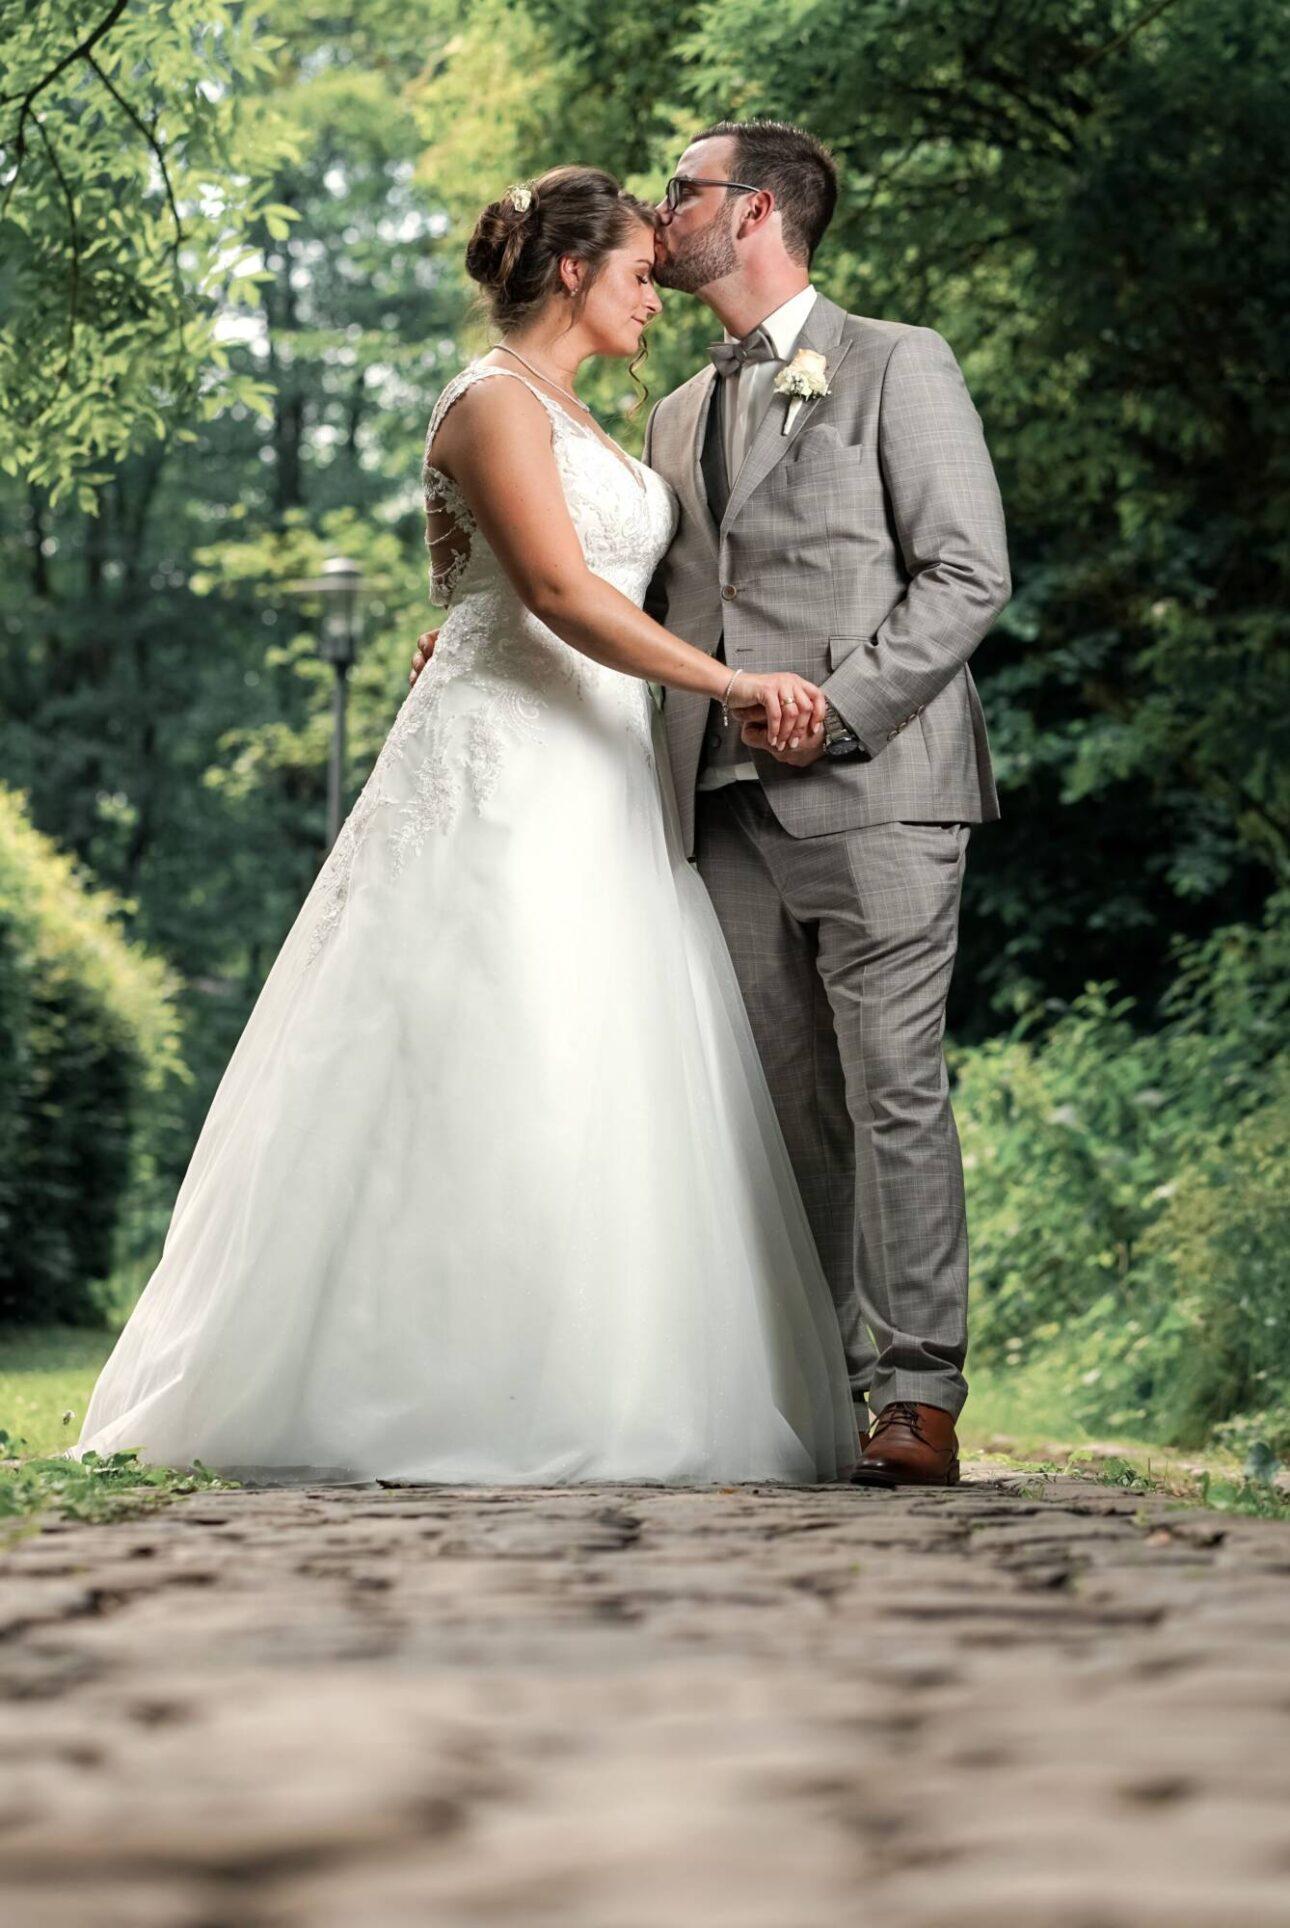 VanessaJoshua24_Hochzeitsfotograf_Koeln